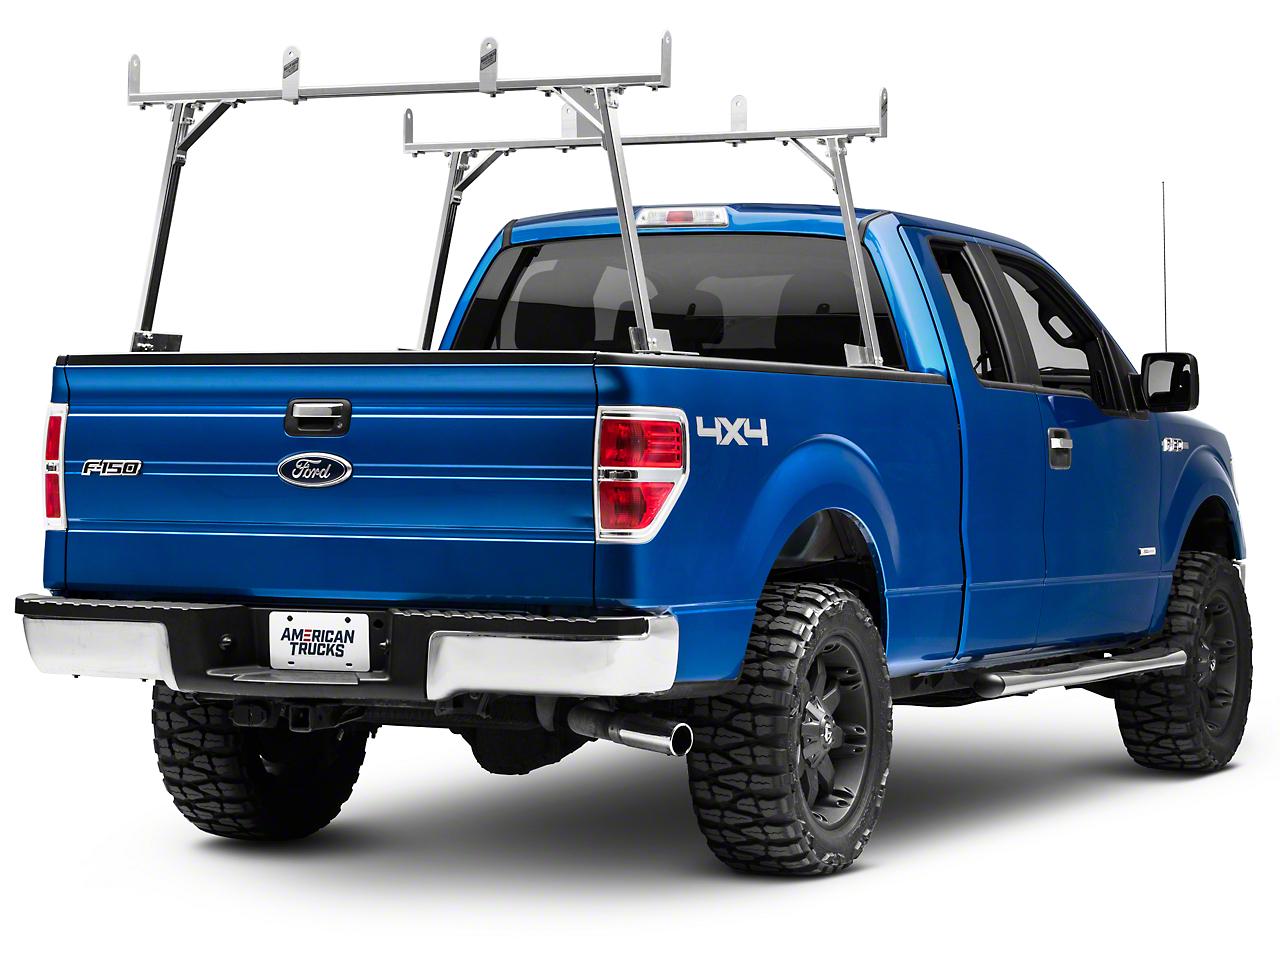 Hauler Racks Aluminum Econo Truck Rack - 800 lb. Capacity (97-18 F-150)